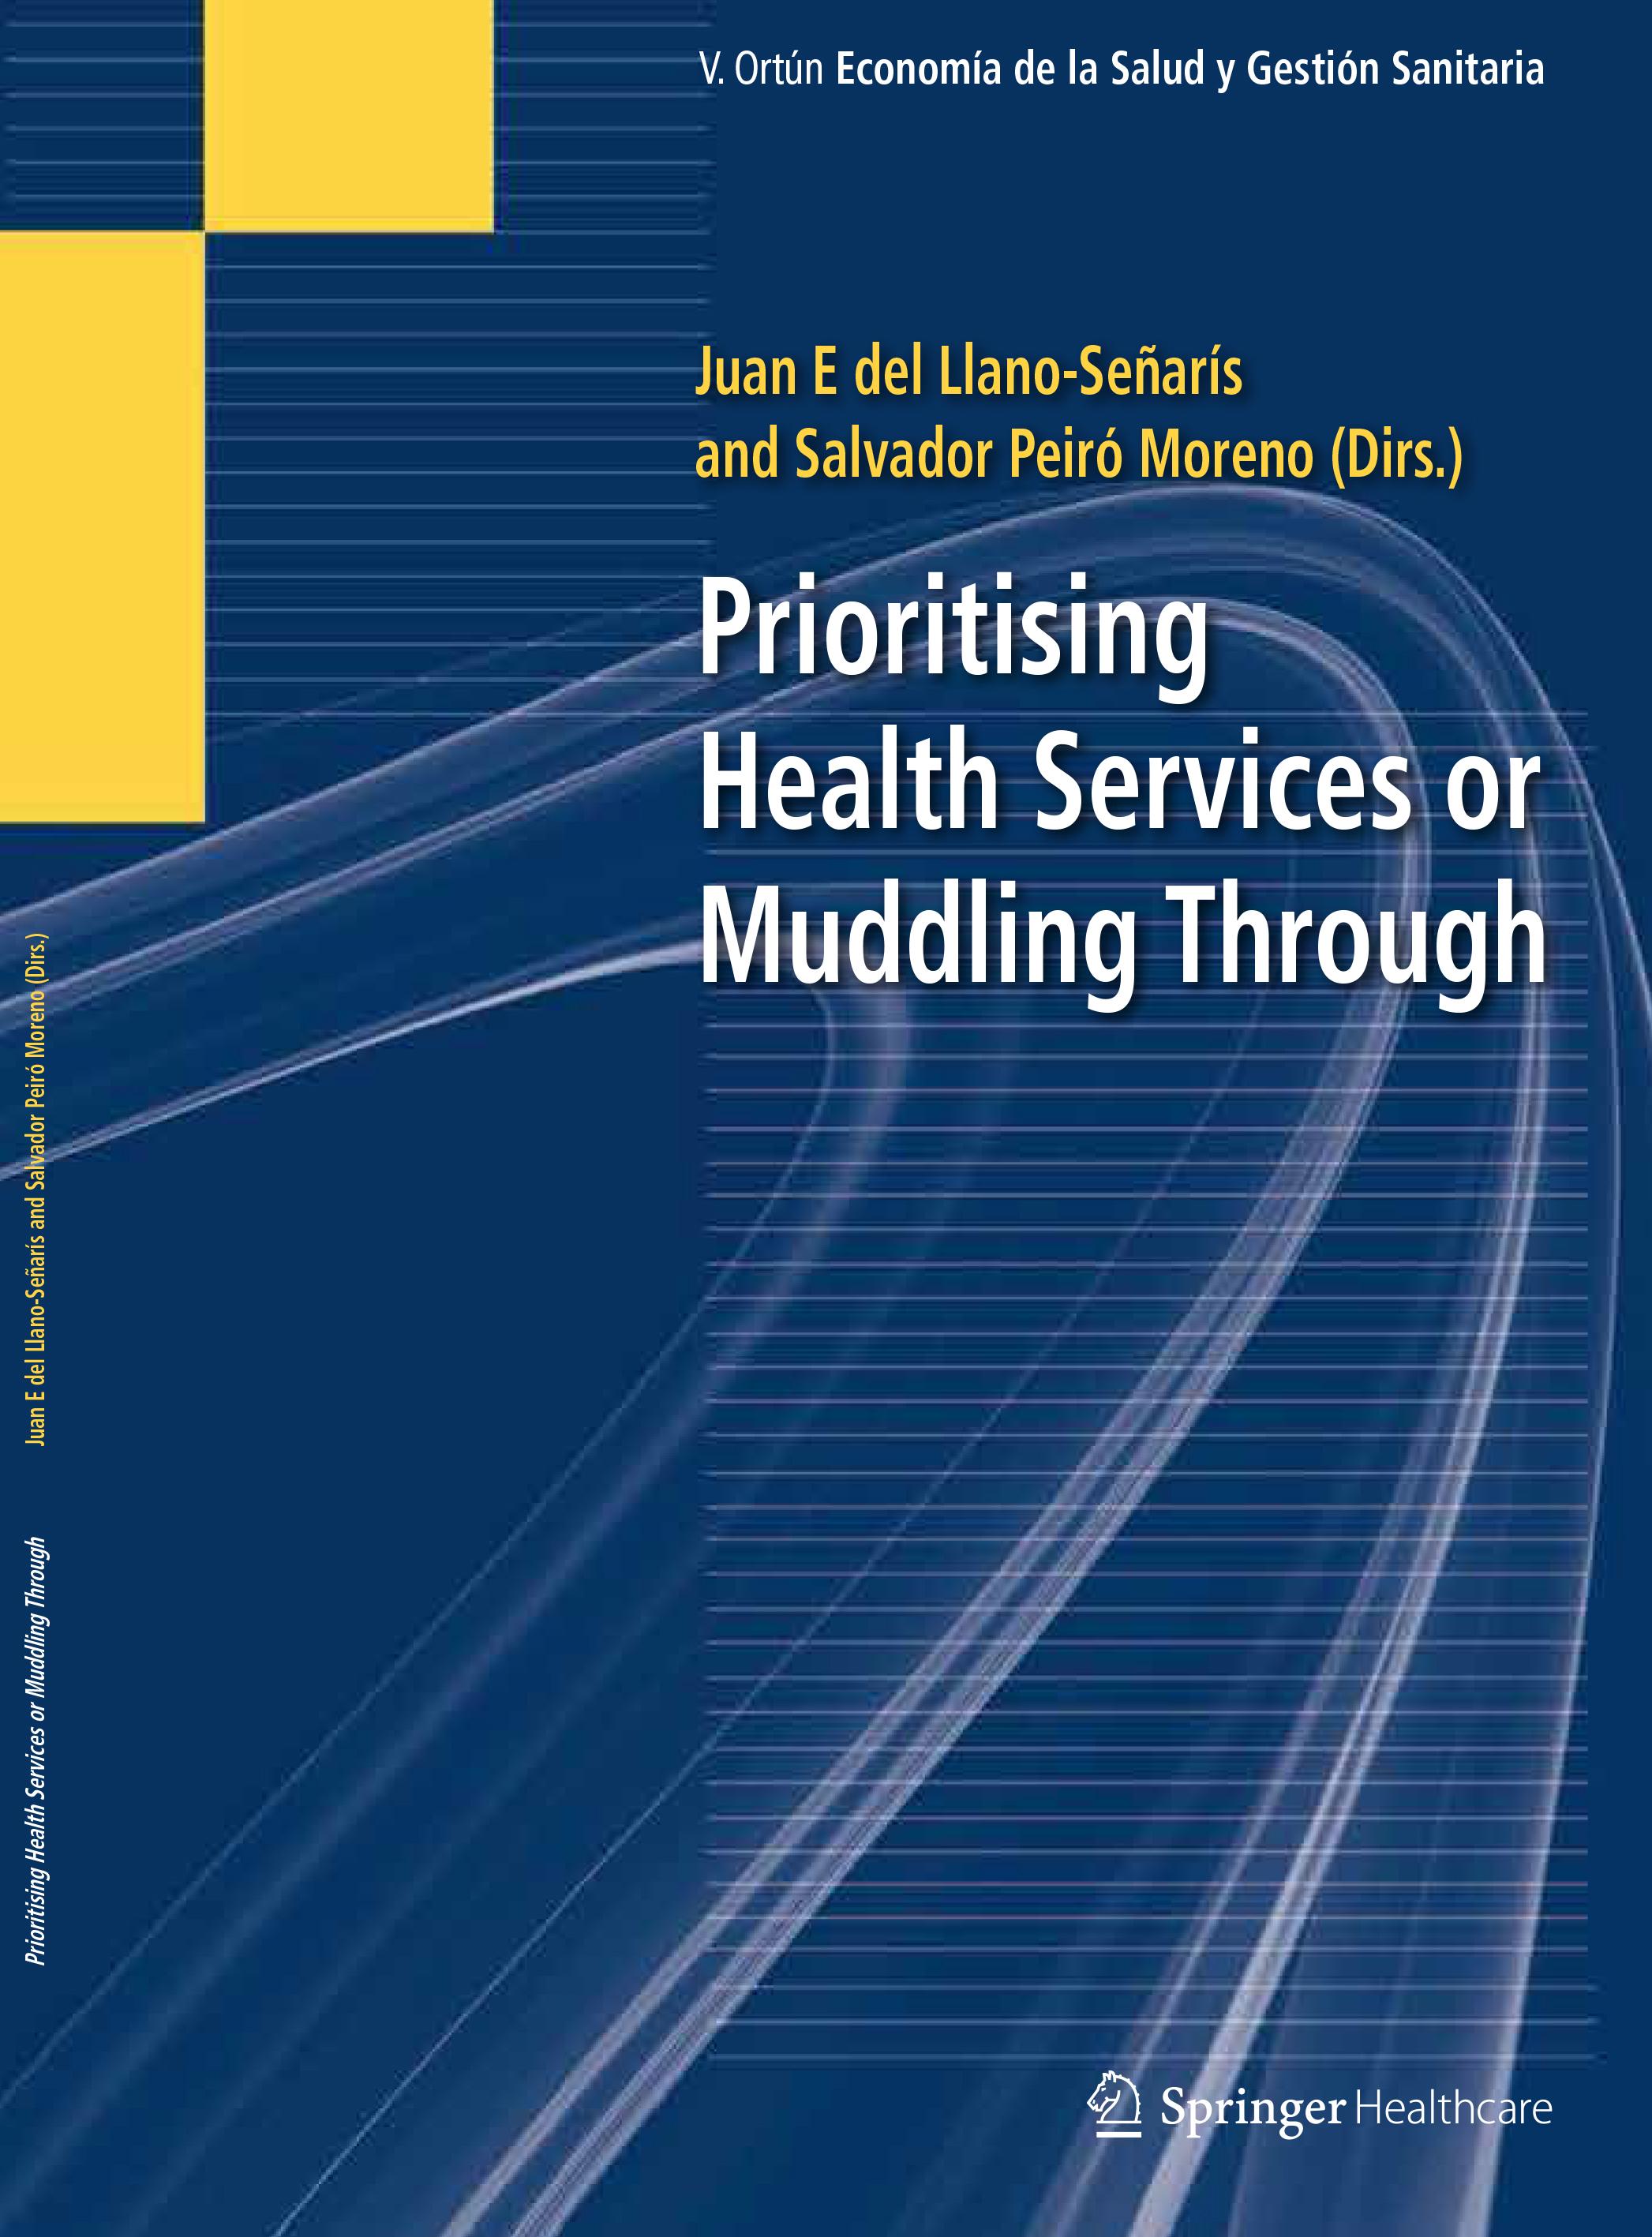 Prioritising health services or muddling through / Juan E. del Llano-Señarís  [et al.]